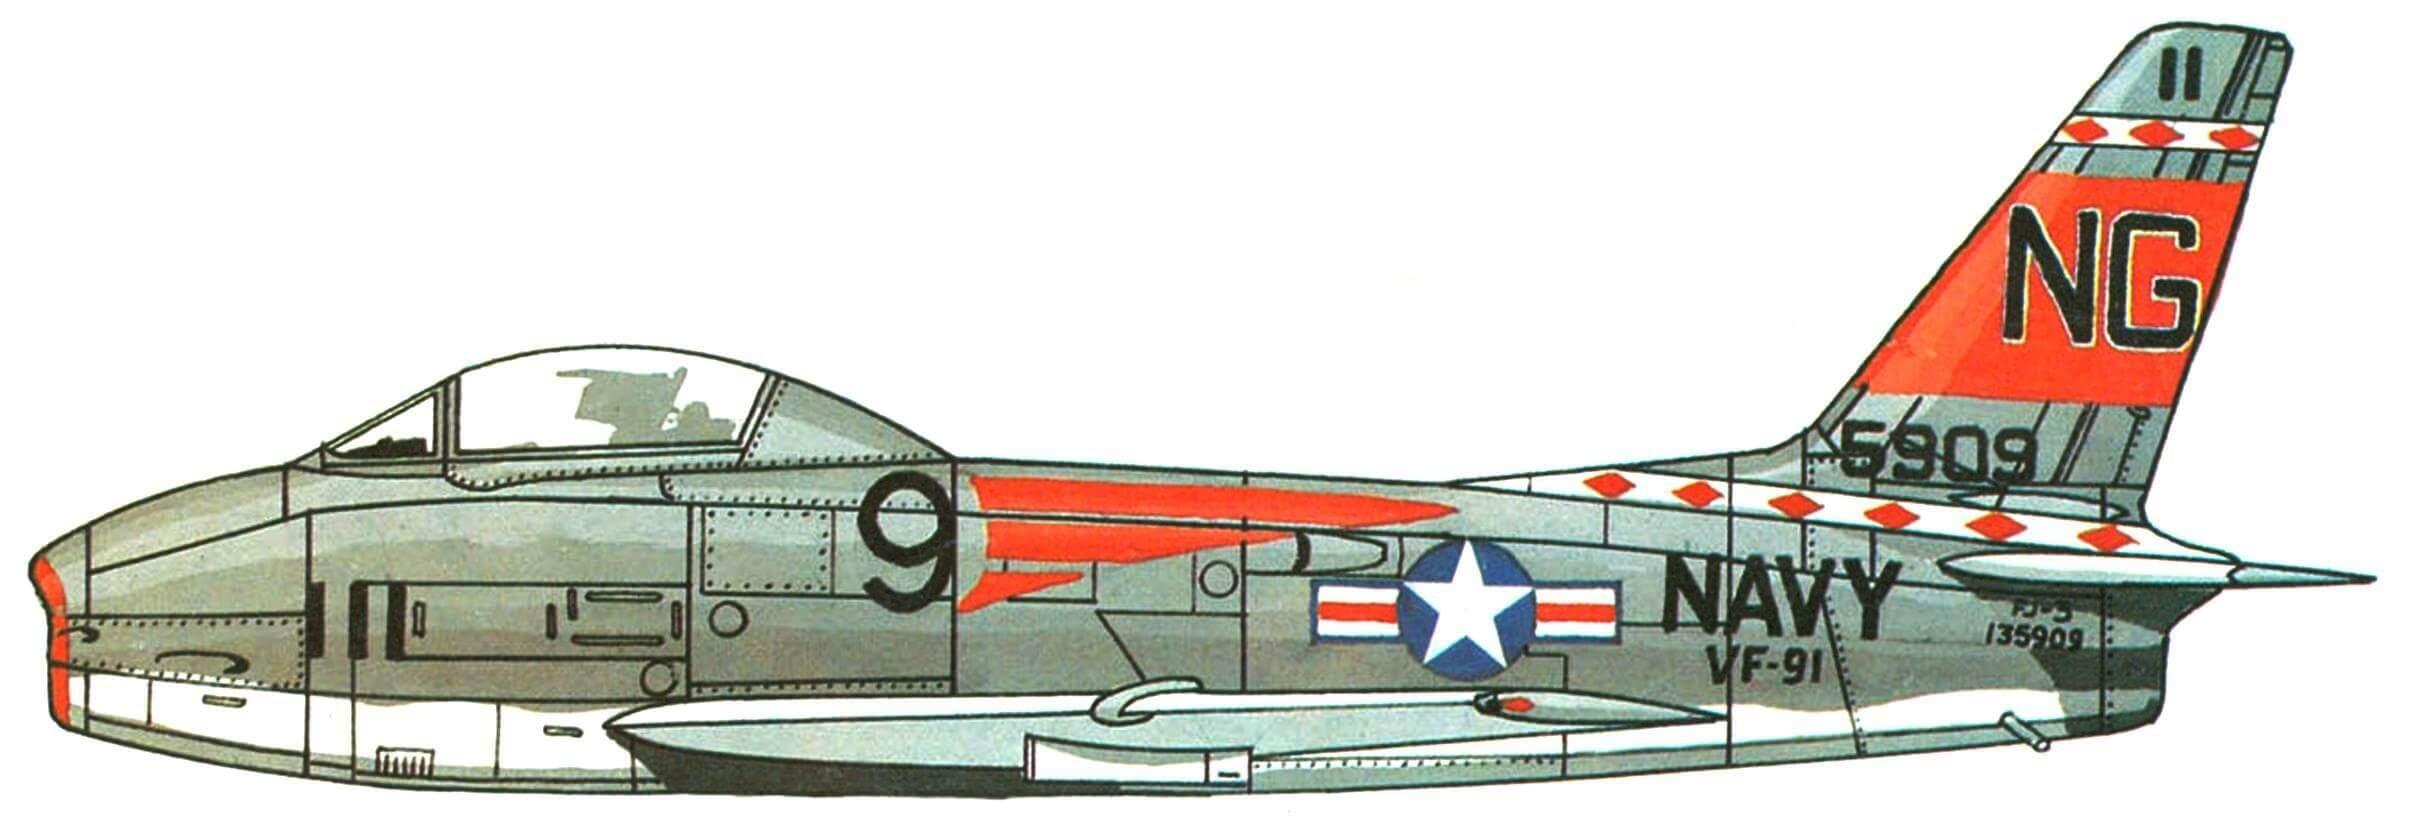 "FJ-3 эскадрильи VF-91, авианосец ""Ticonderoga"", 1958г."